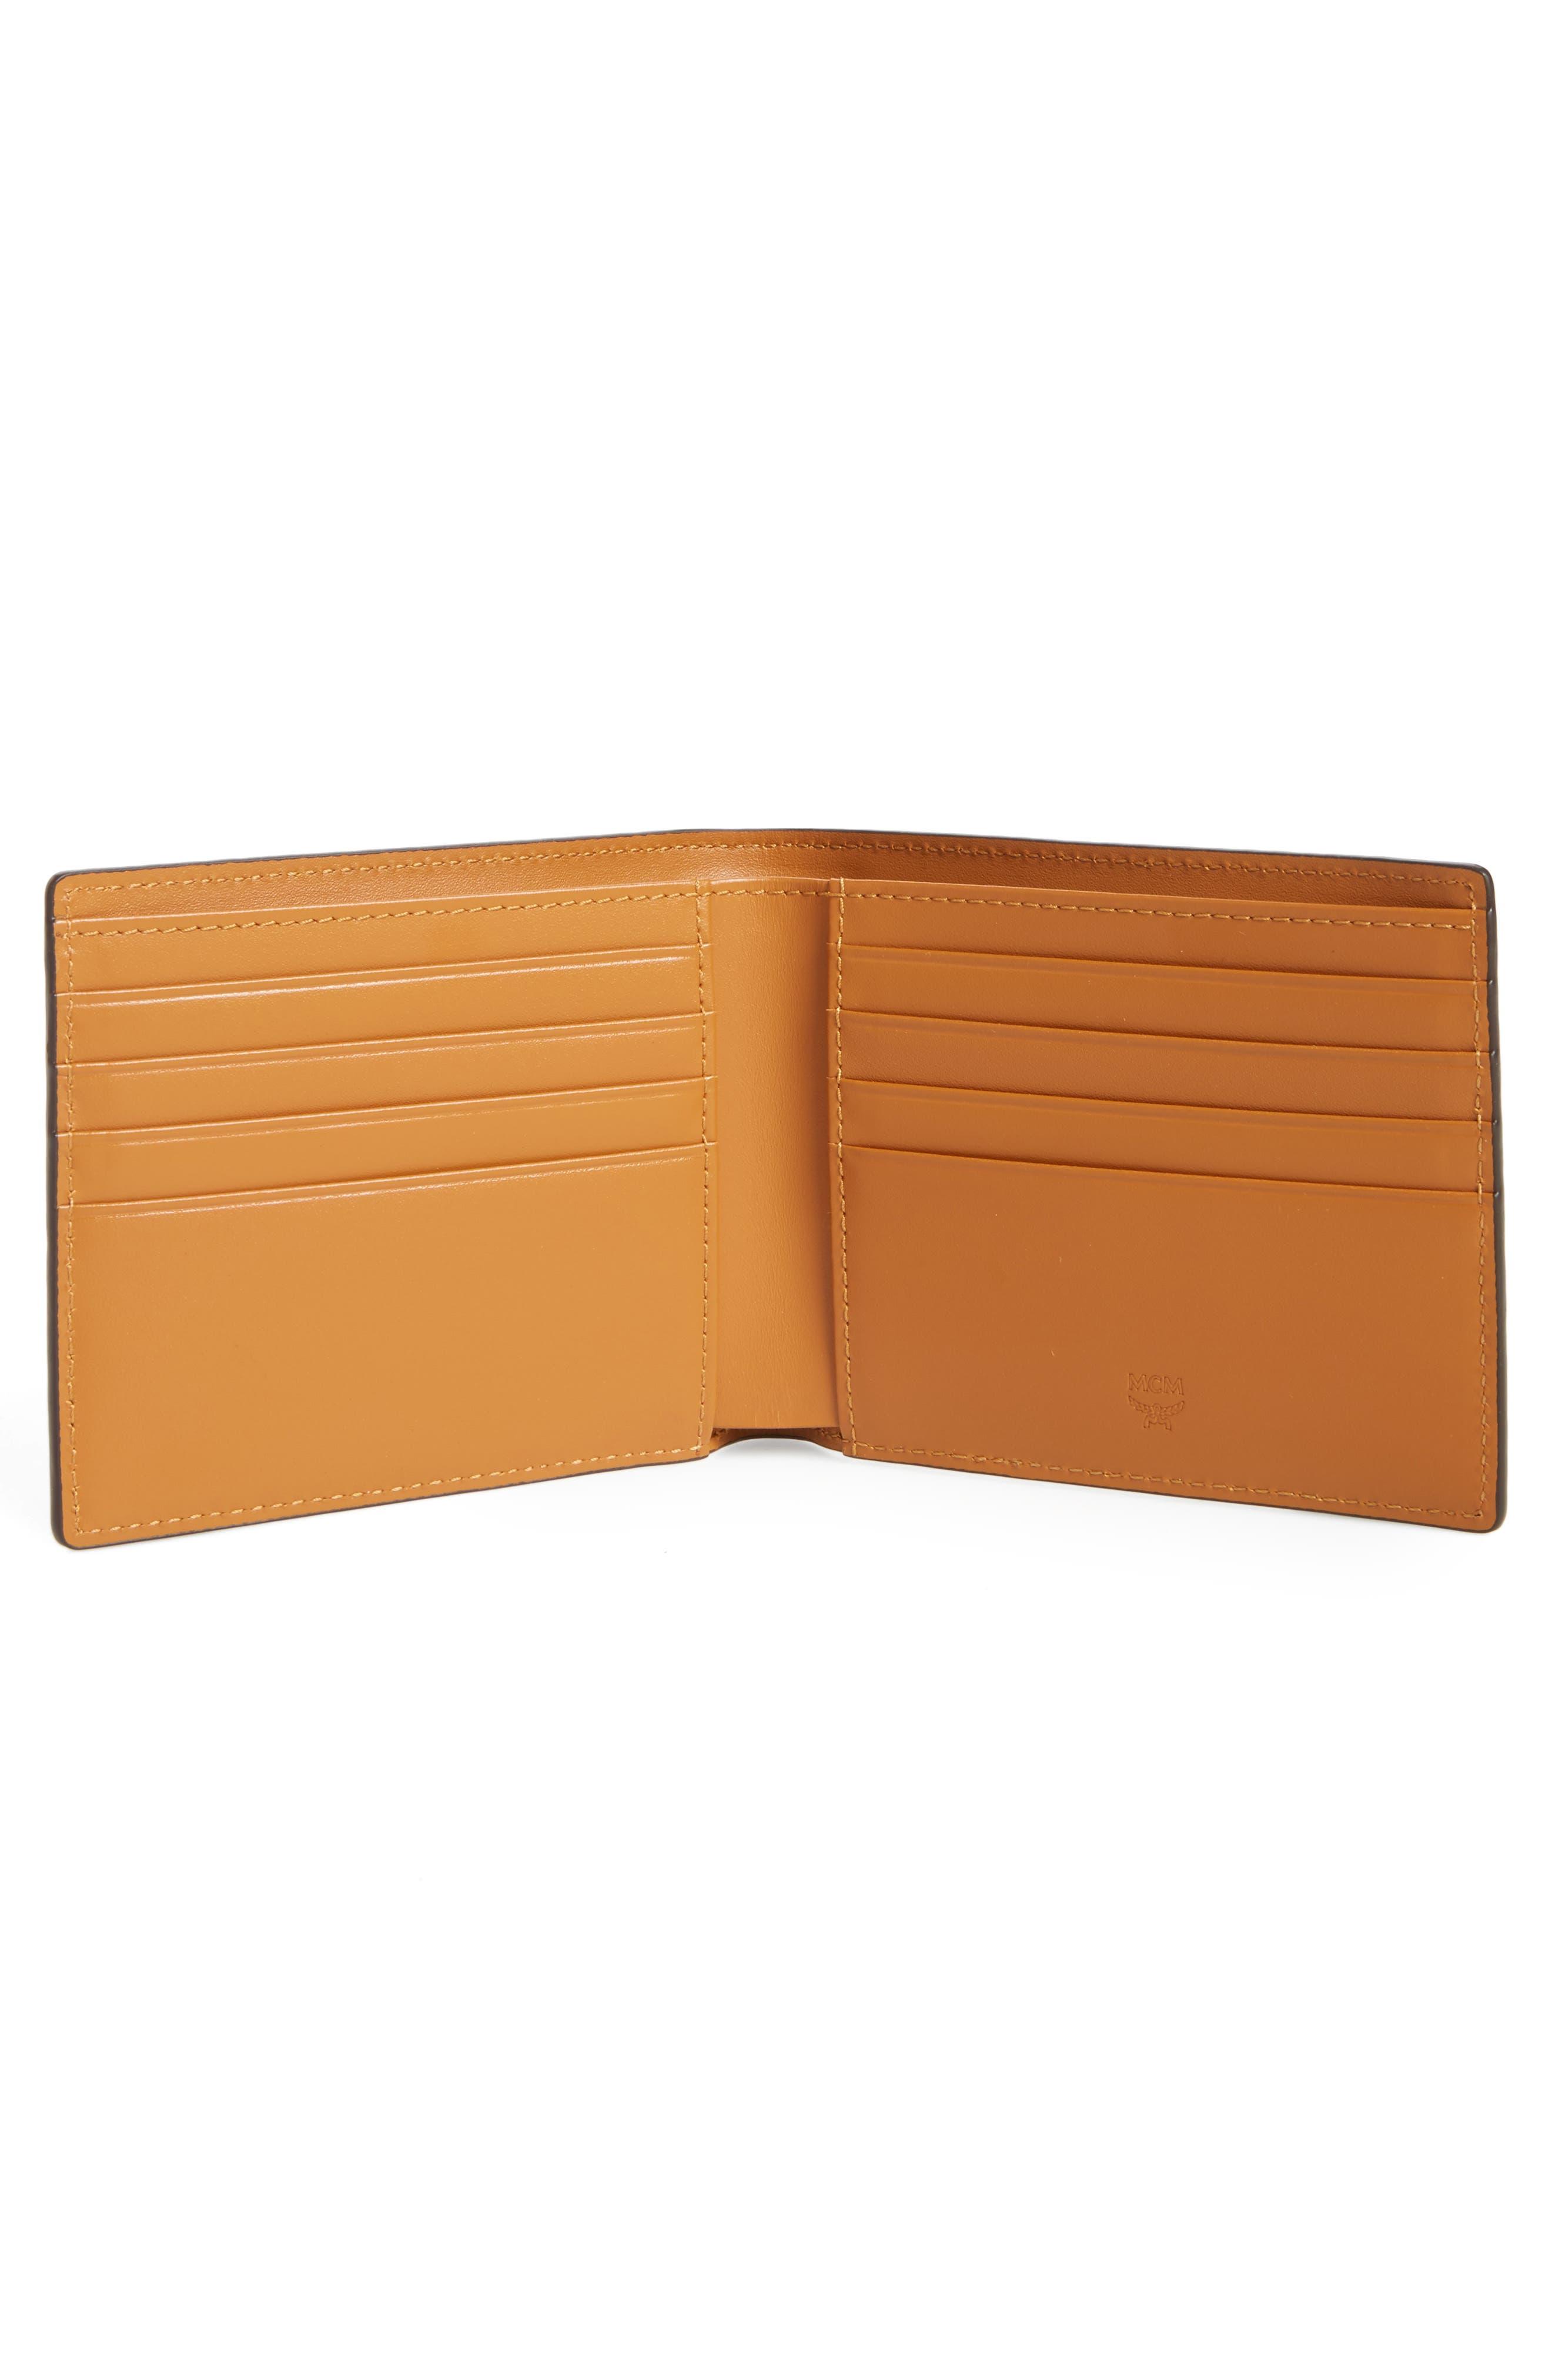 Gunta Visetos Faux Leather Wallet,                             Alternate thumbnail 2, color,                             210